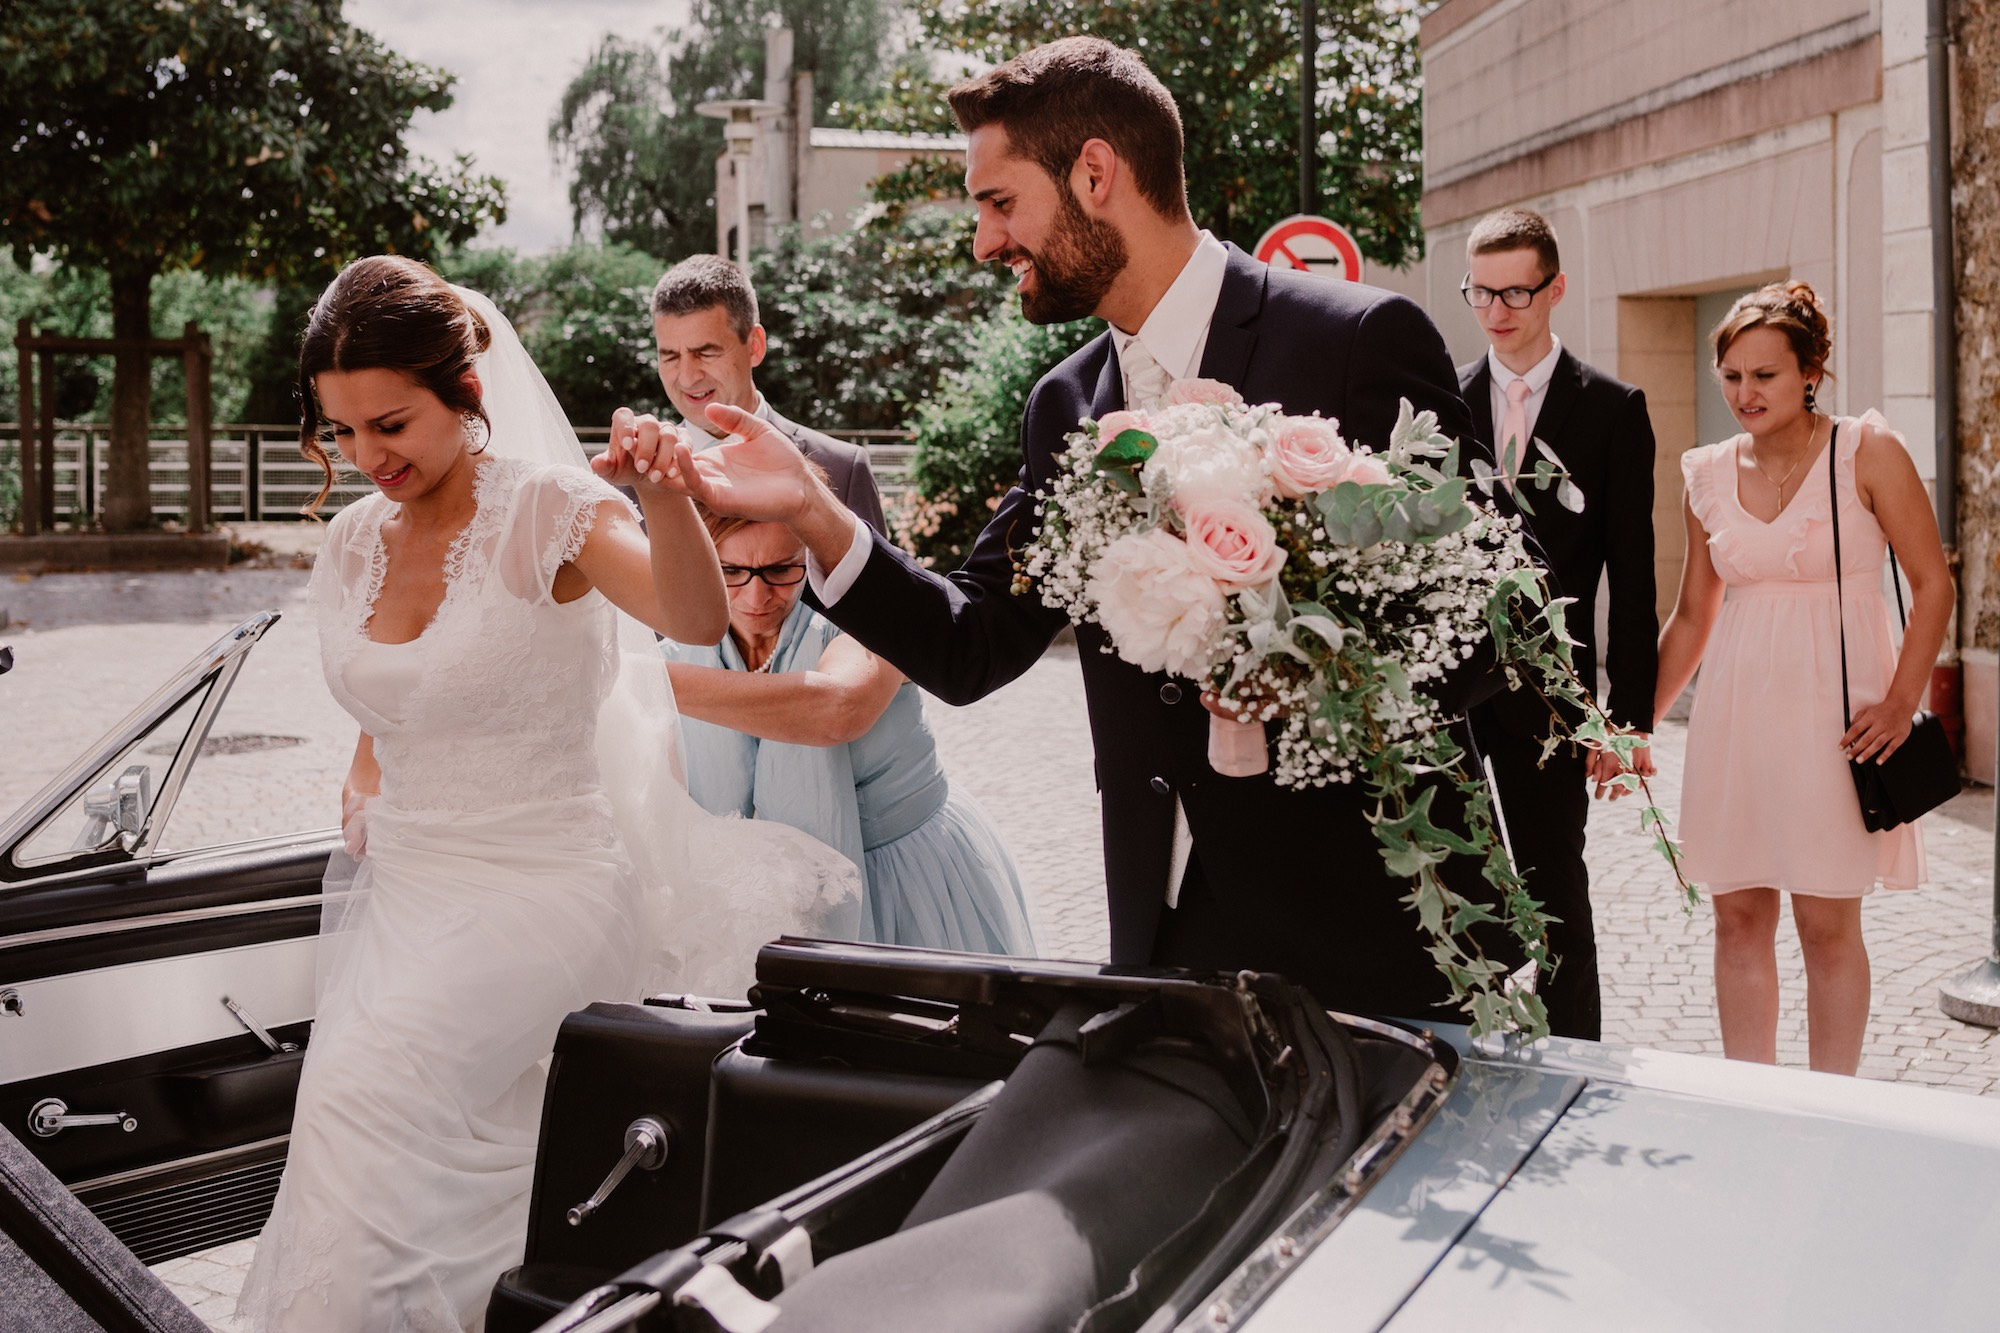 Mariage Lysianne Maxime 205 - Dagmara Bojenko - Eco-conscious Weddings, Births & Families